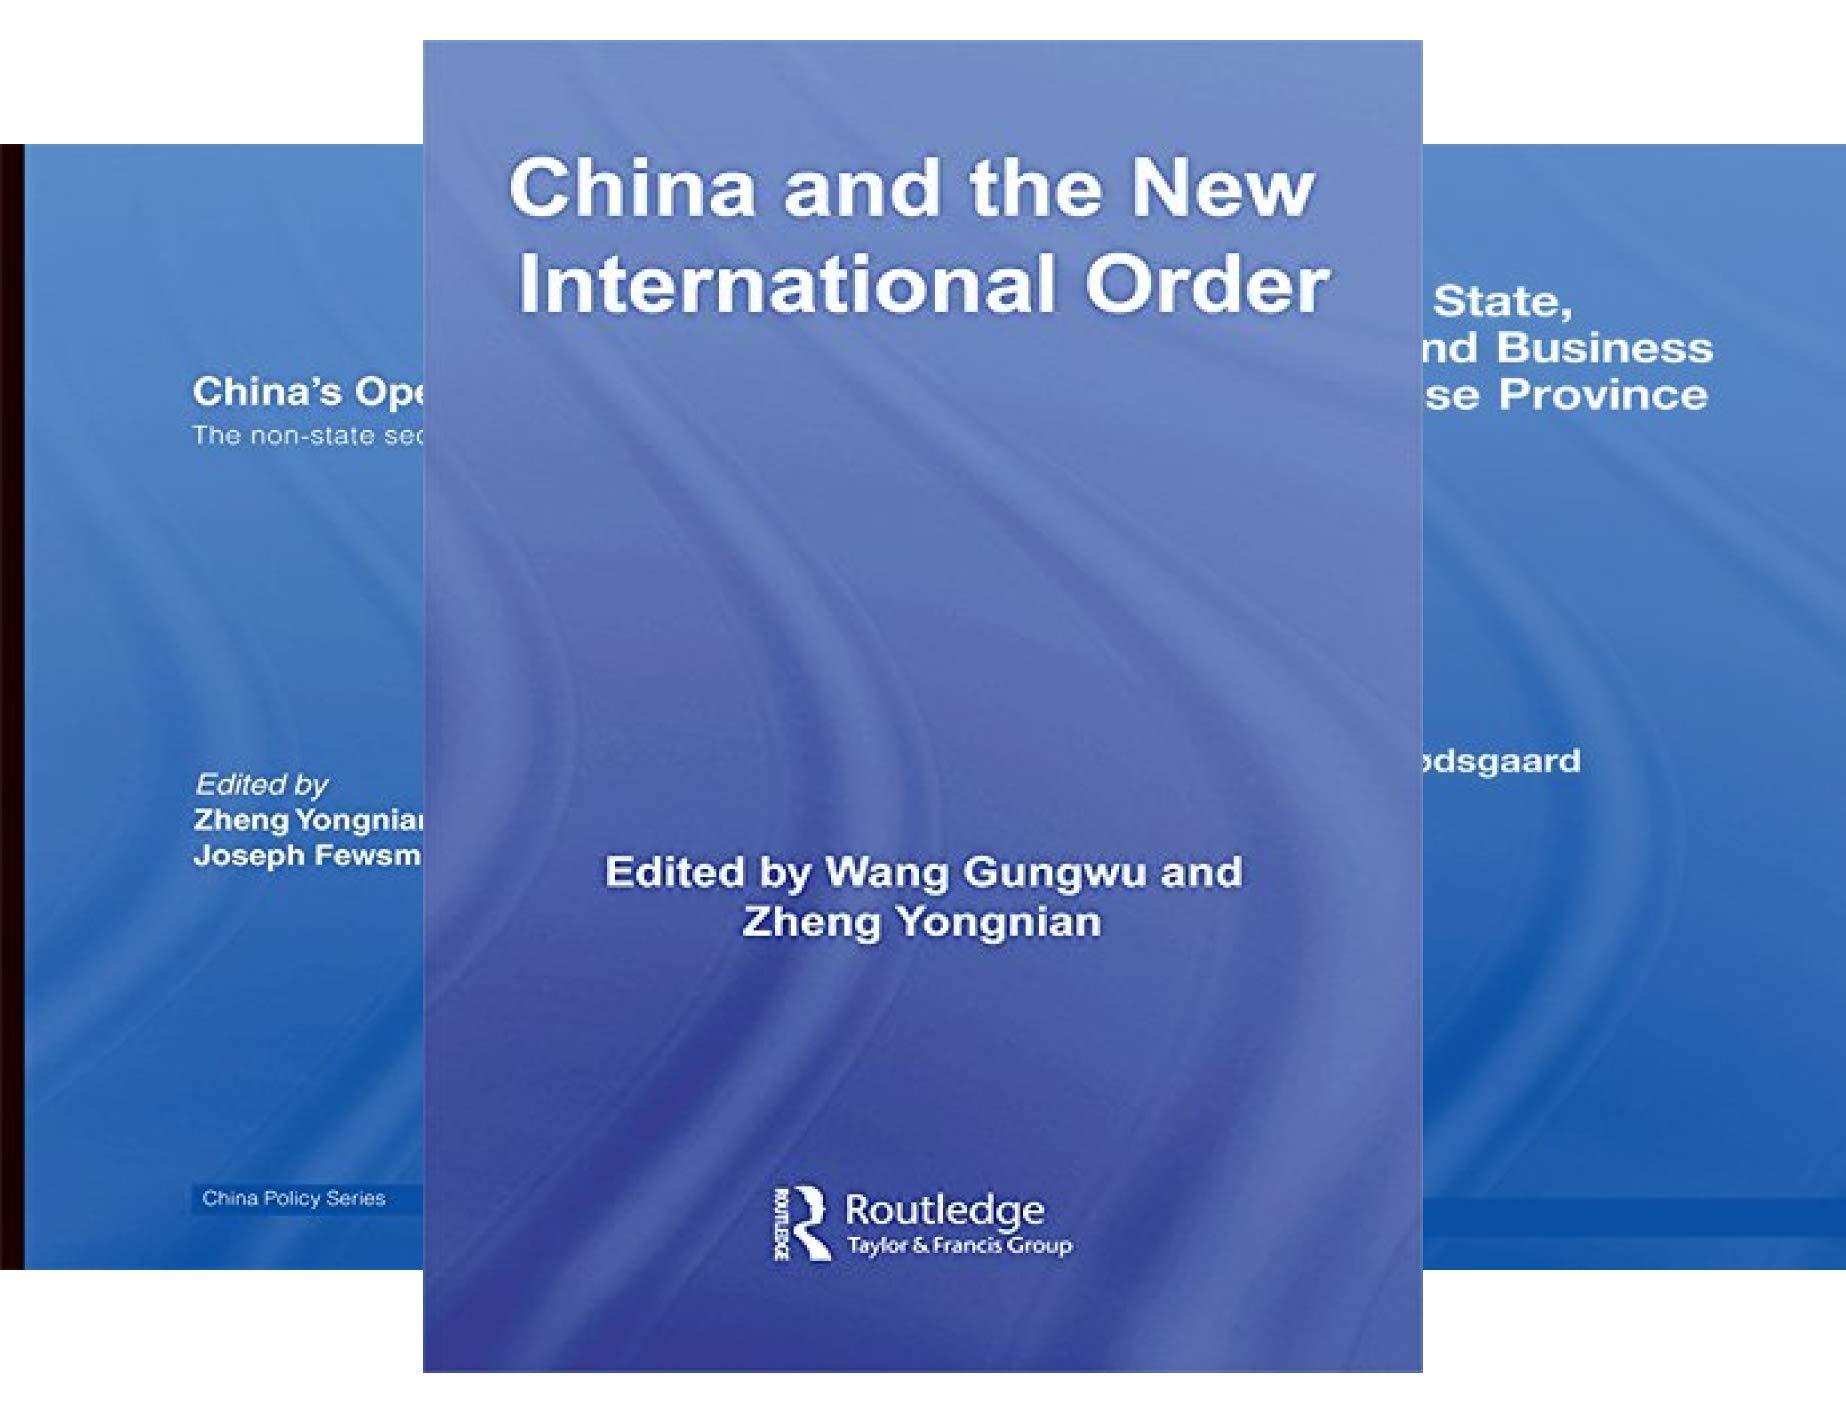 China Policy (20 Book Series)